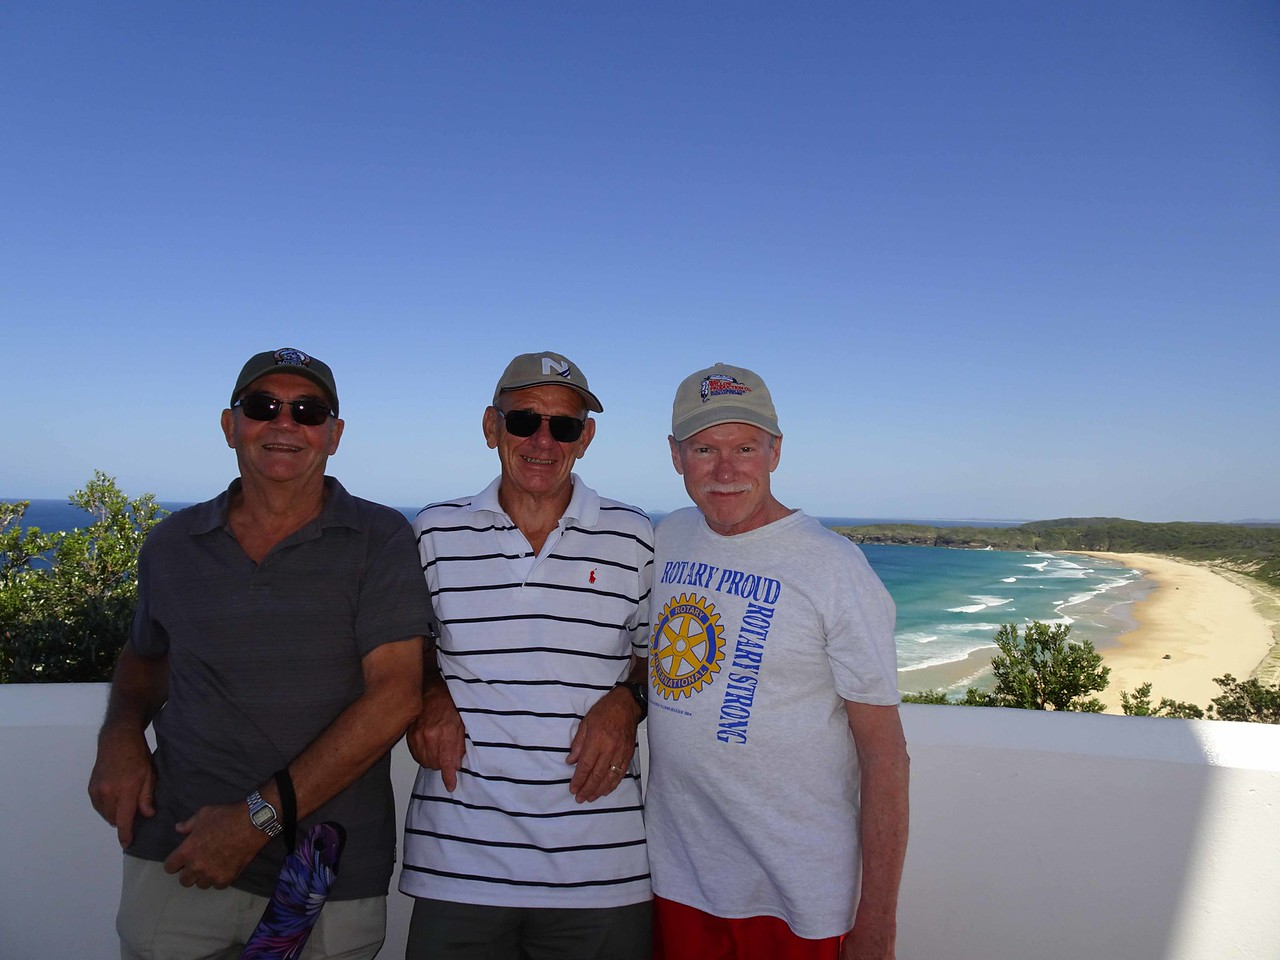 674 Frank, Ian and Bruce